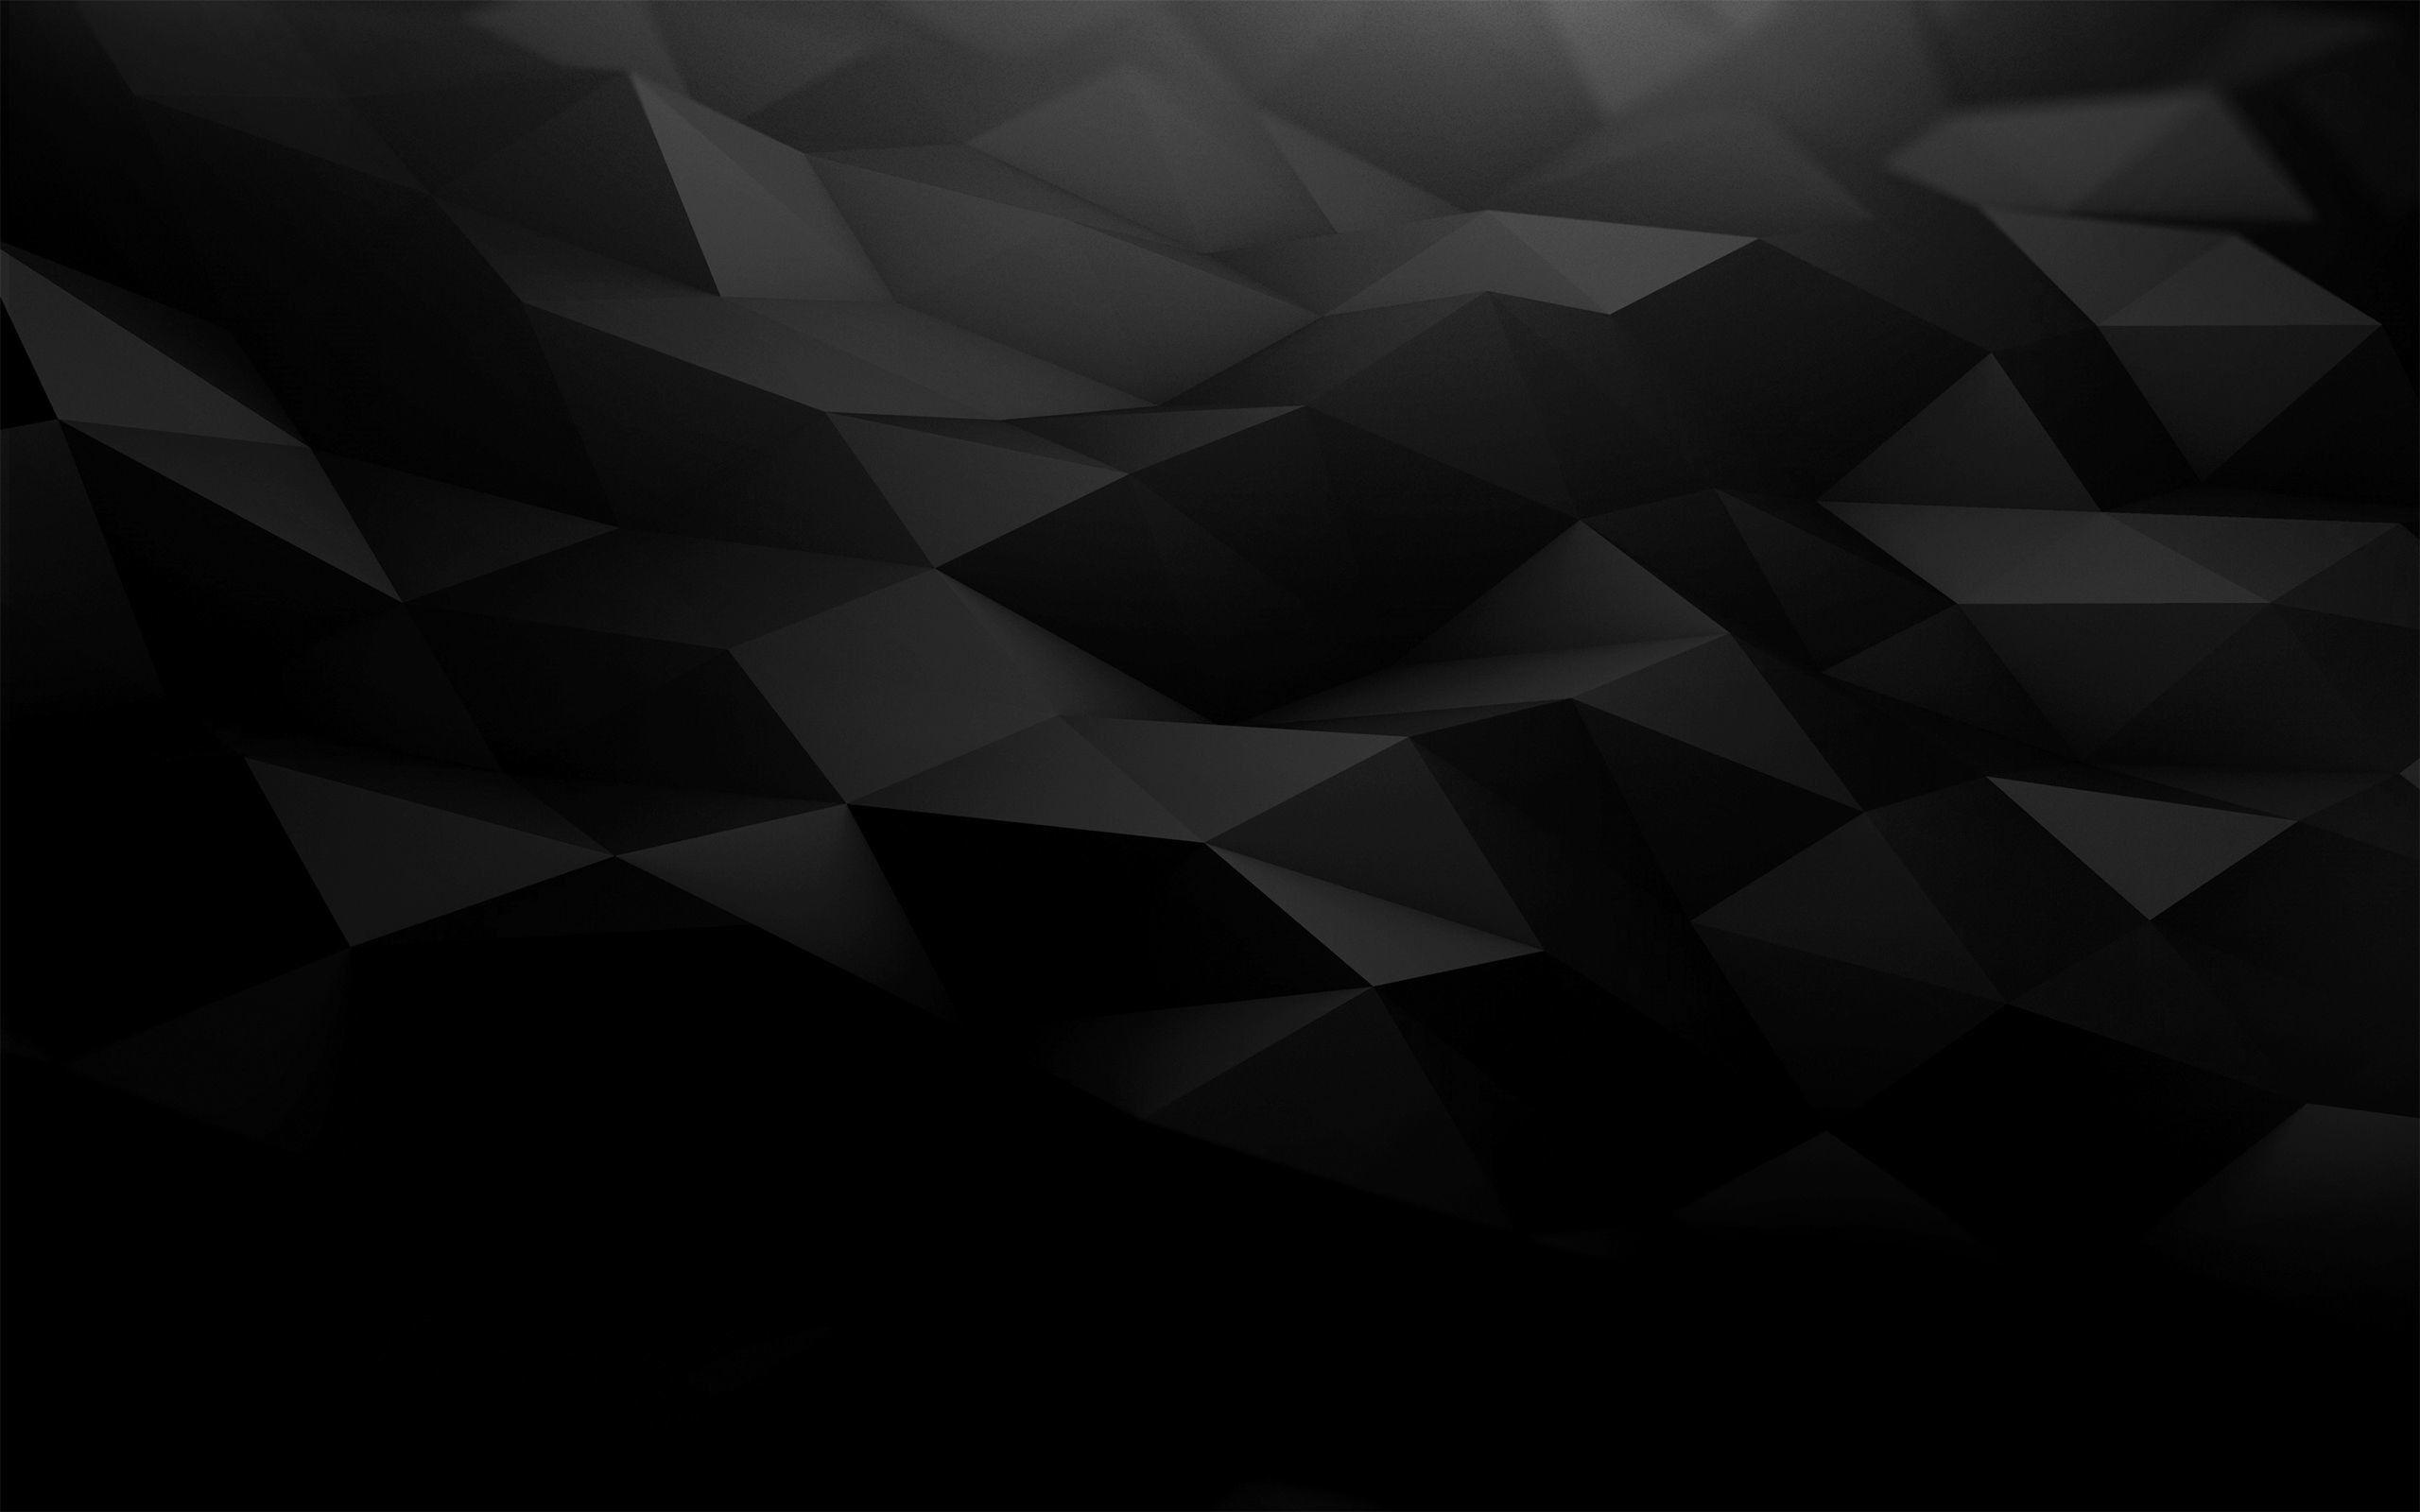 Elegant Black Wallpapers - Top Free Elegant Black Backgrounds -  WallpaperAccess